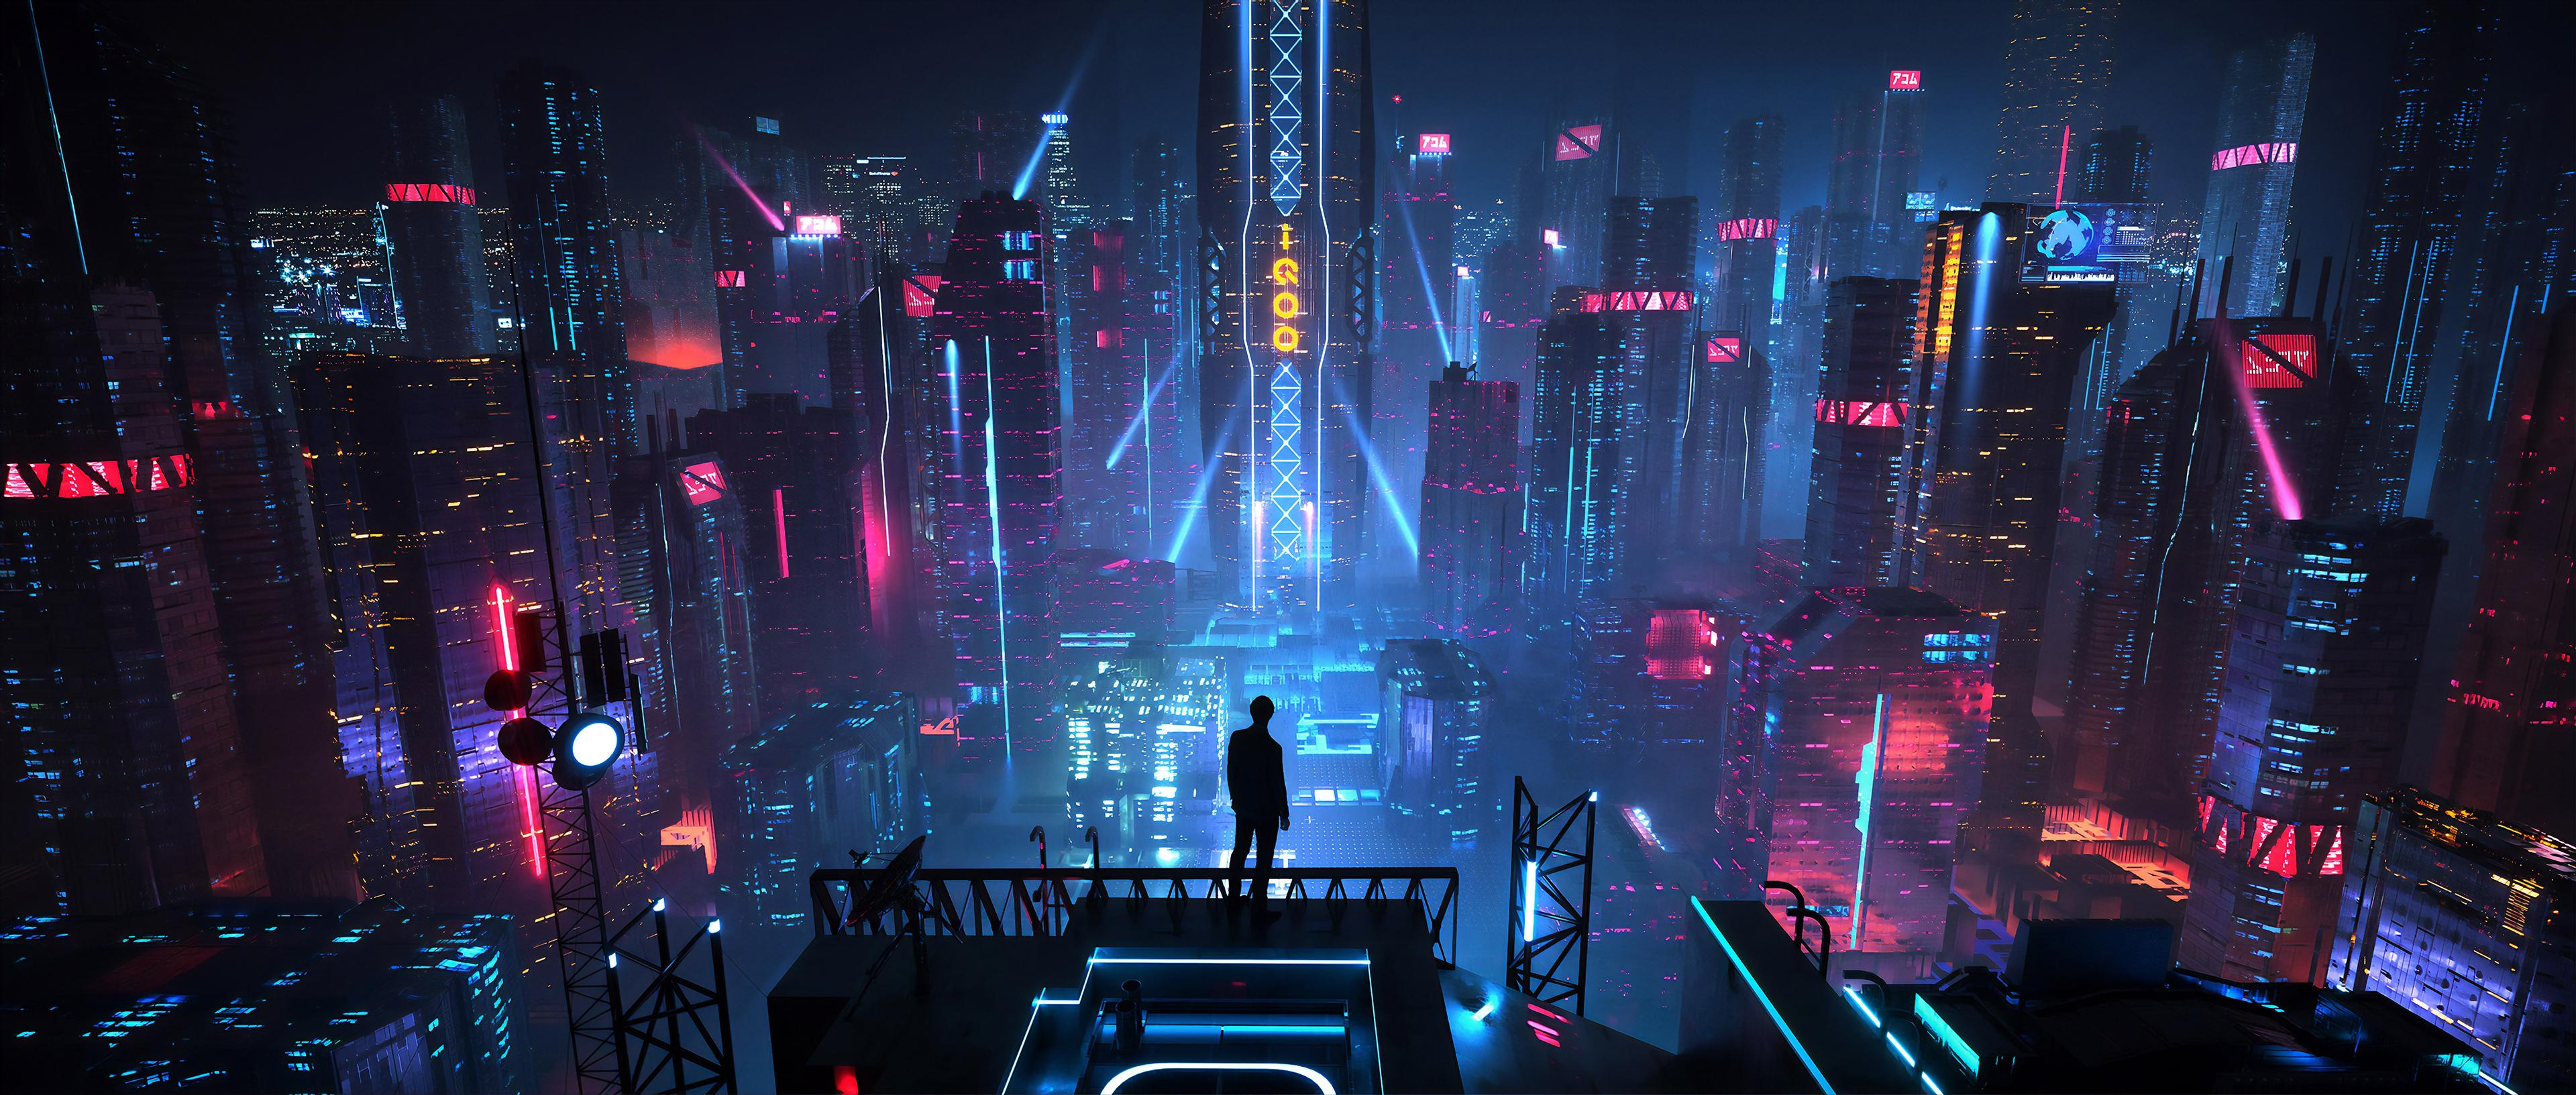 General 3840x1633 digital art men city futuristic night neon science fiction futuristic city cyberpunk Xuteng Pan environment artwork concept art